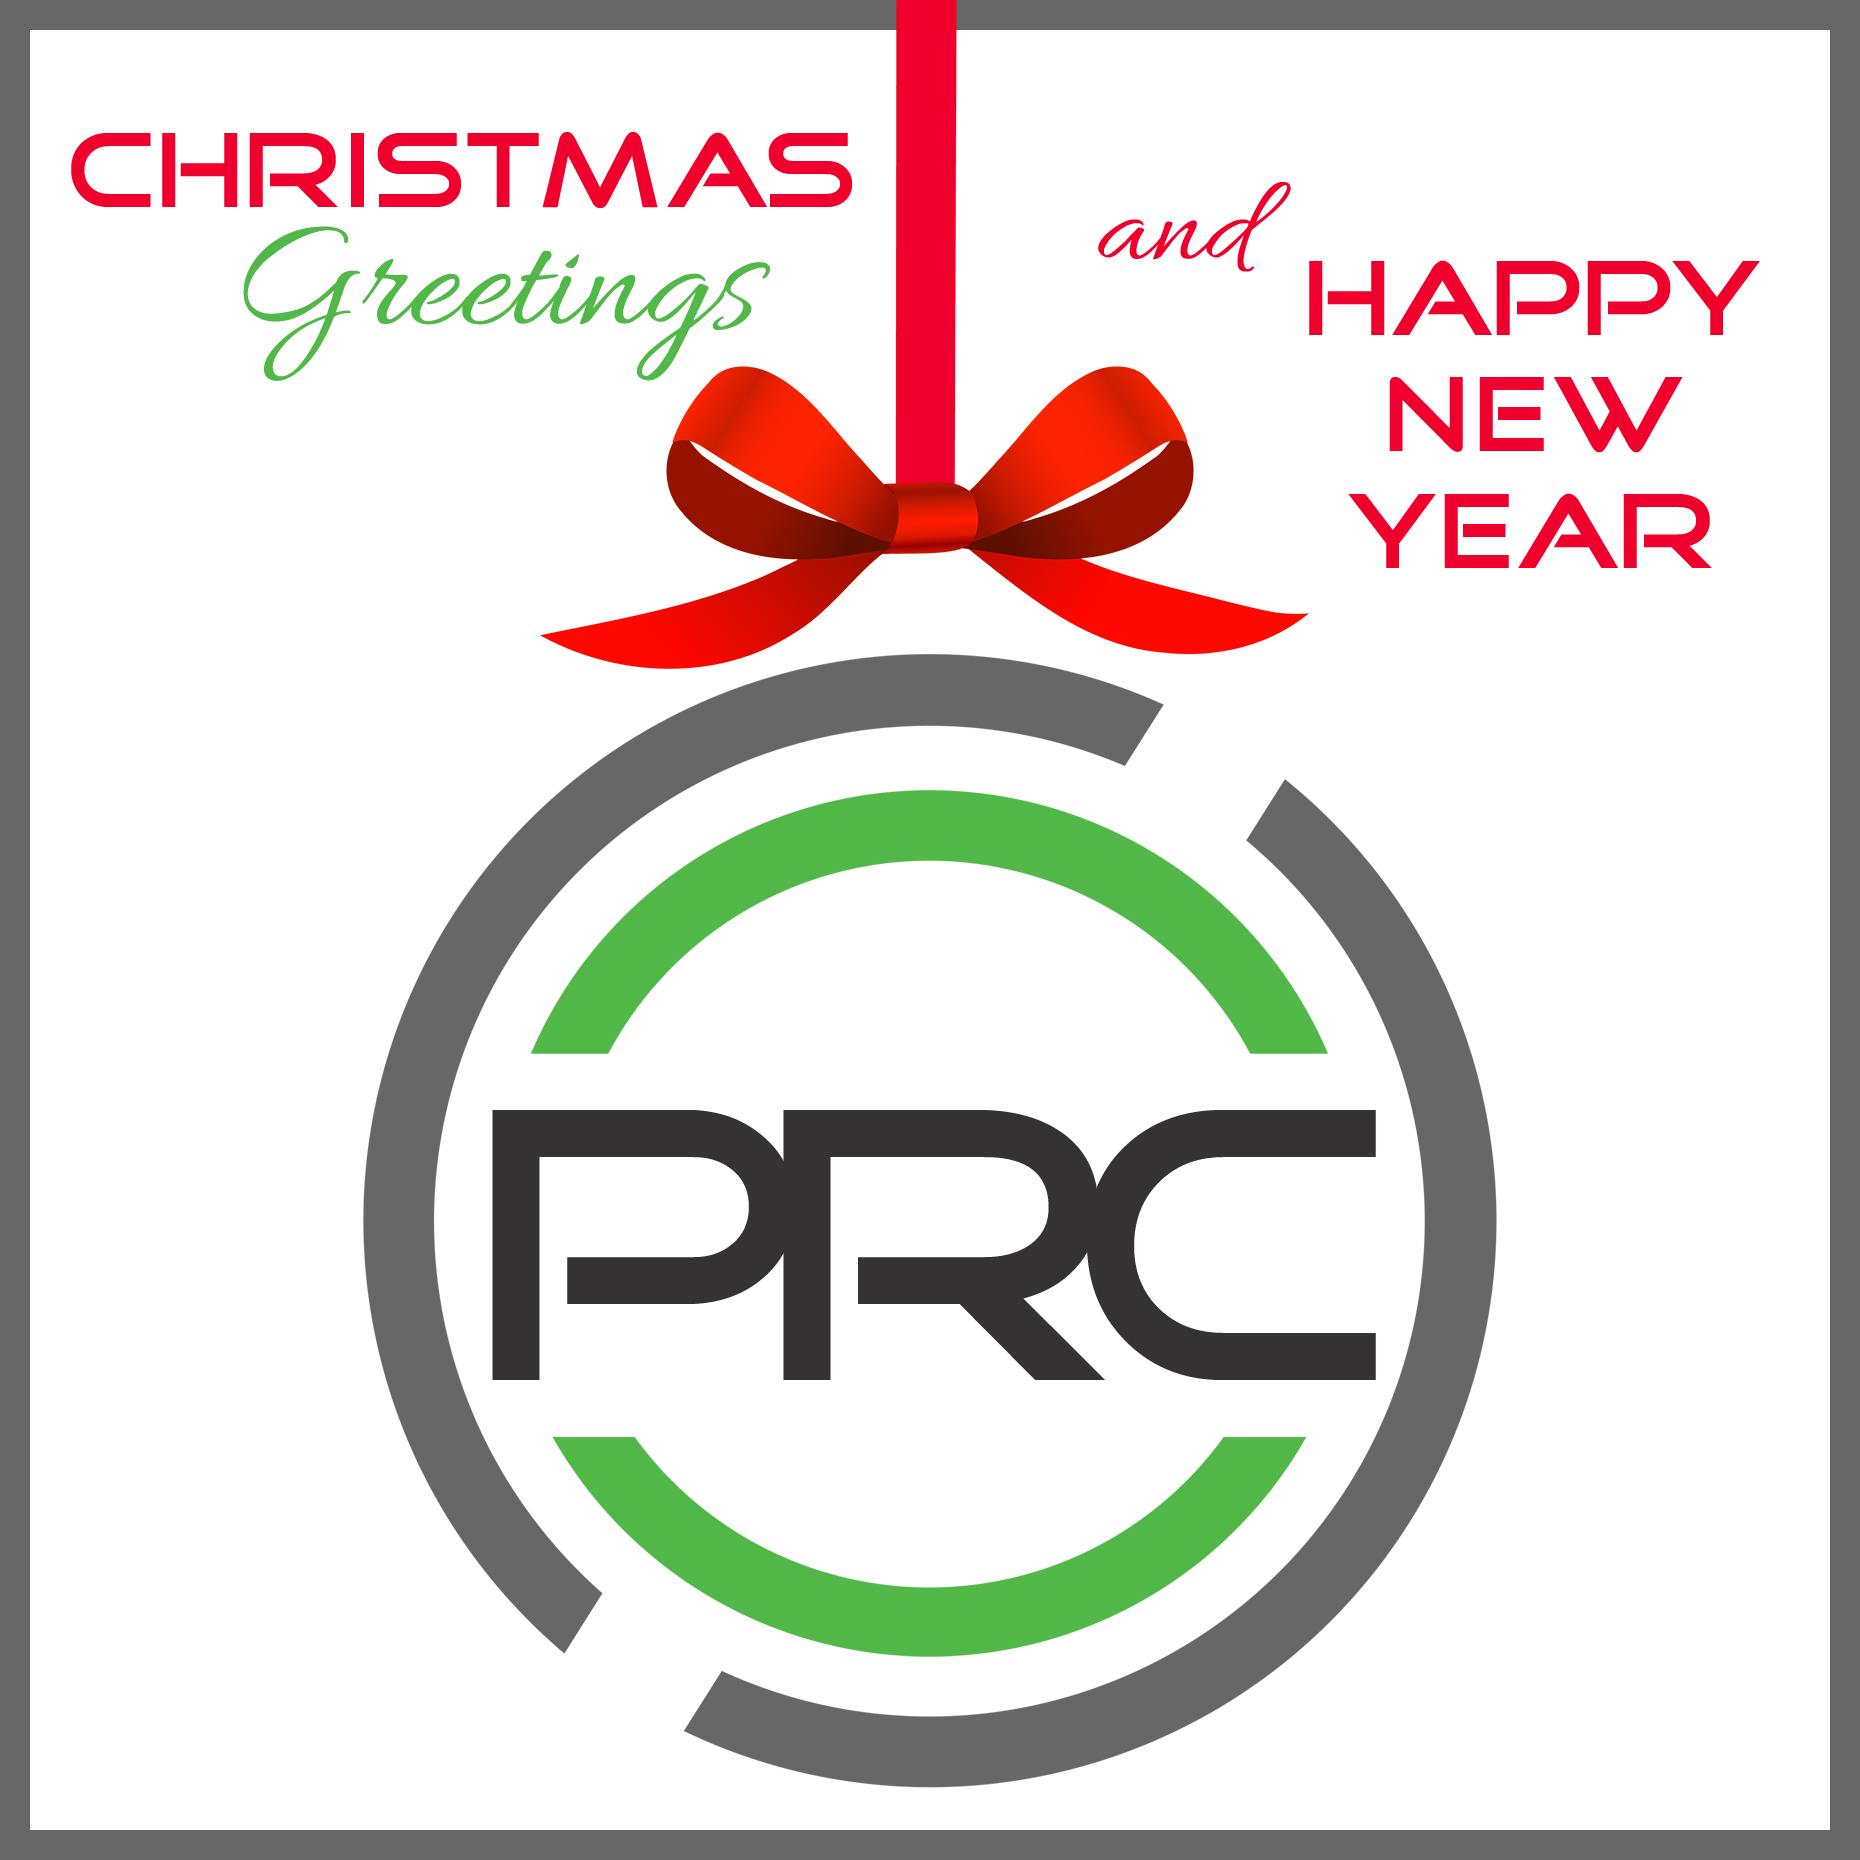 Christmas Greetings & Happy New Year!